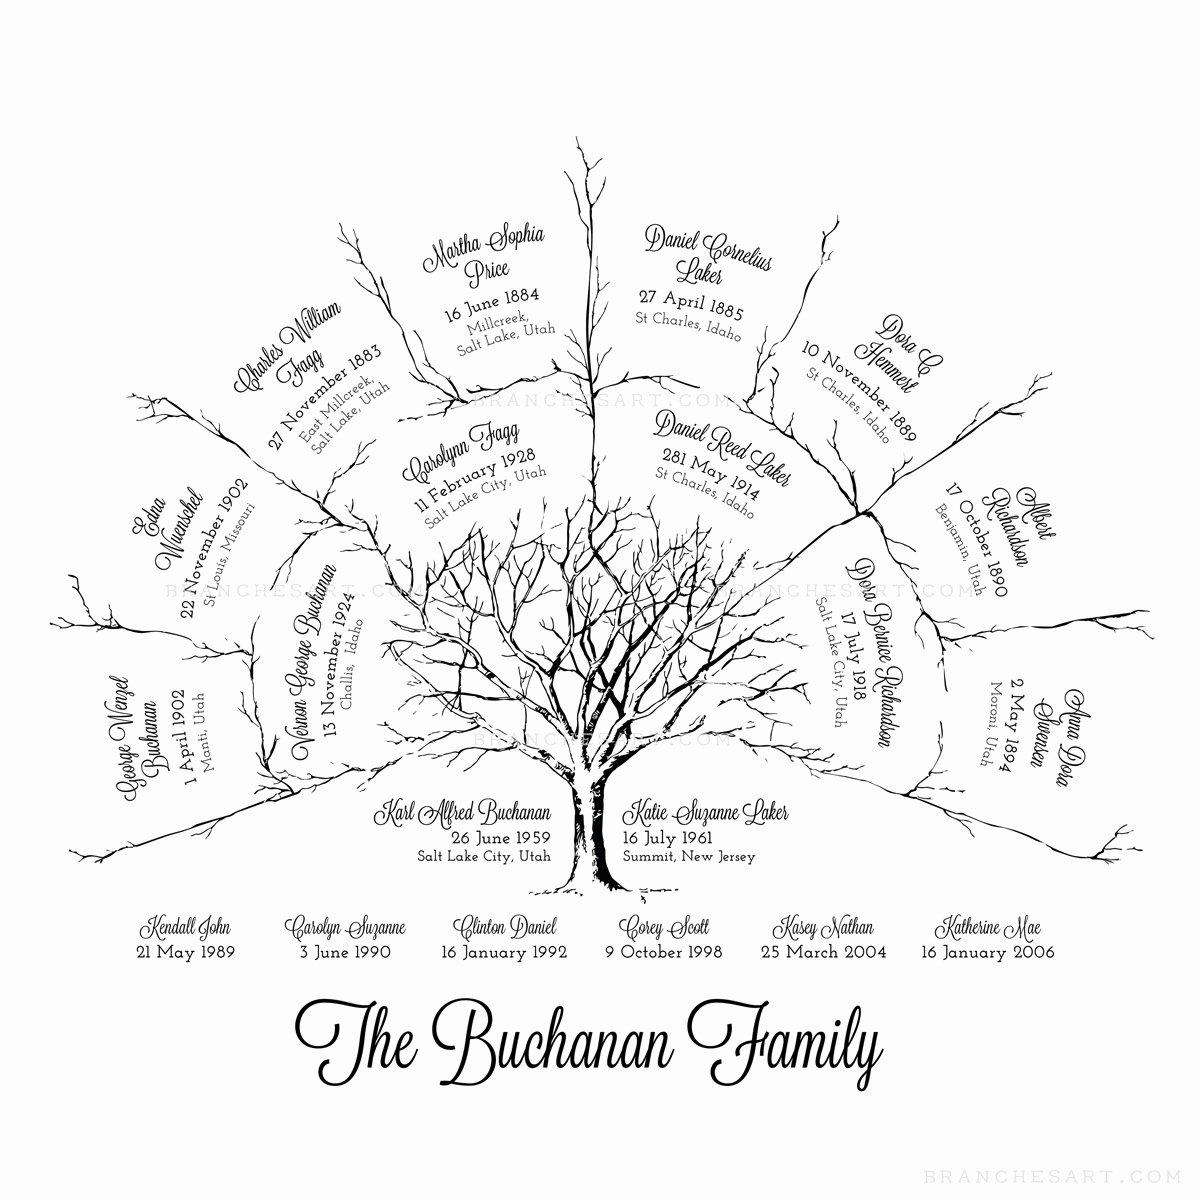 Three Generation Family Tree Luxury 3 Generation Ancestor Family Tree – Branches